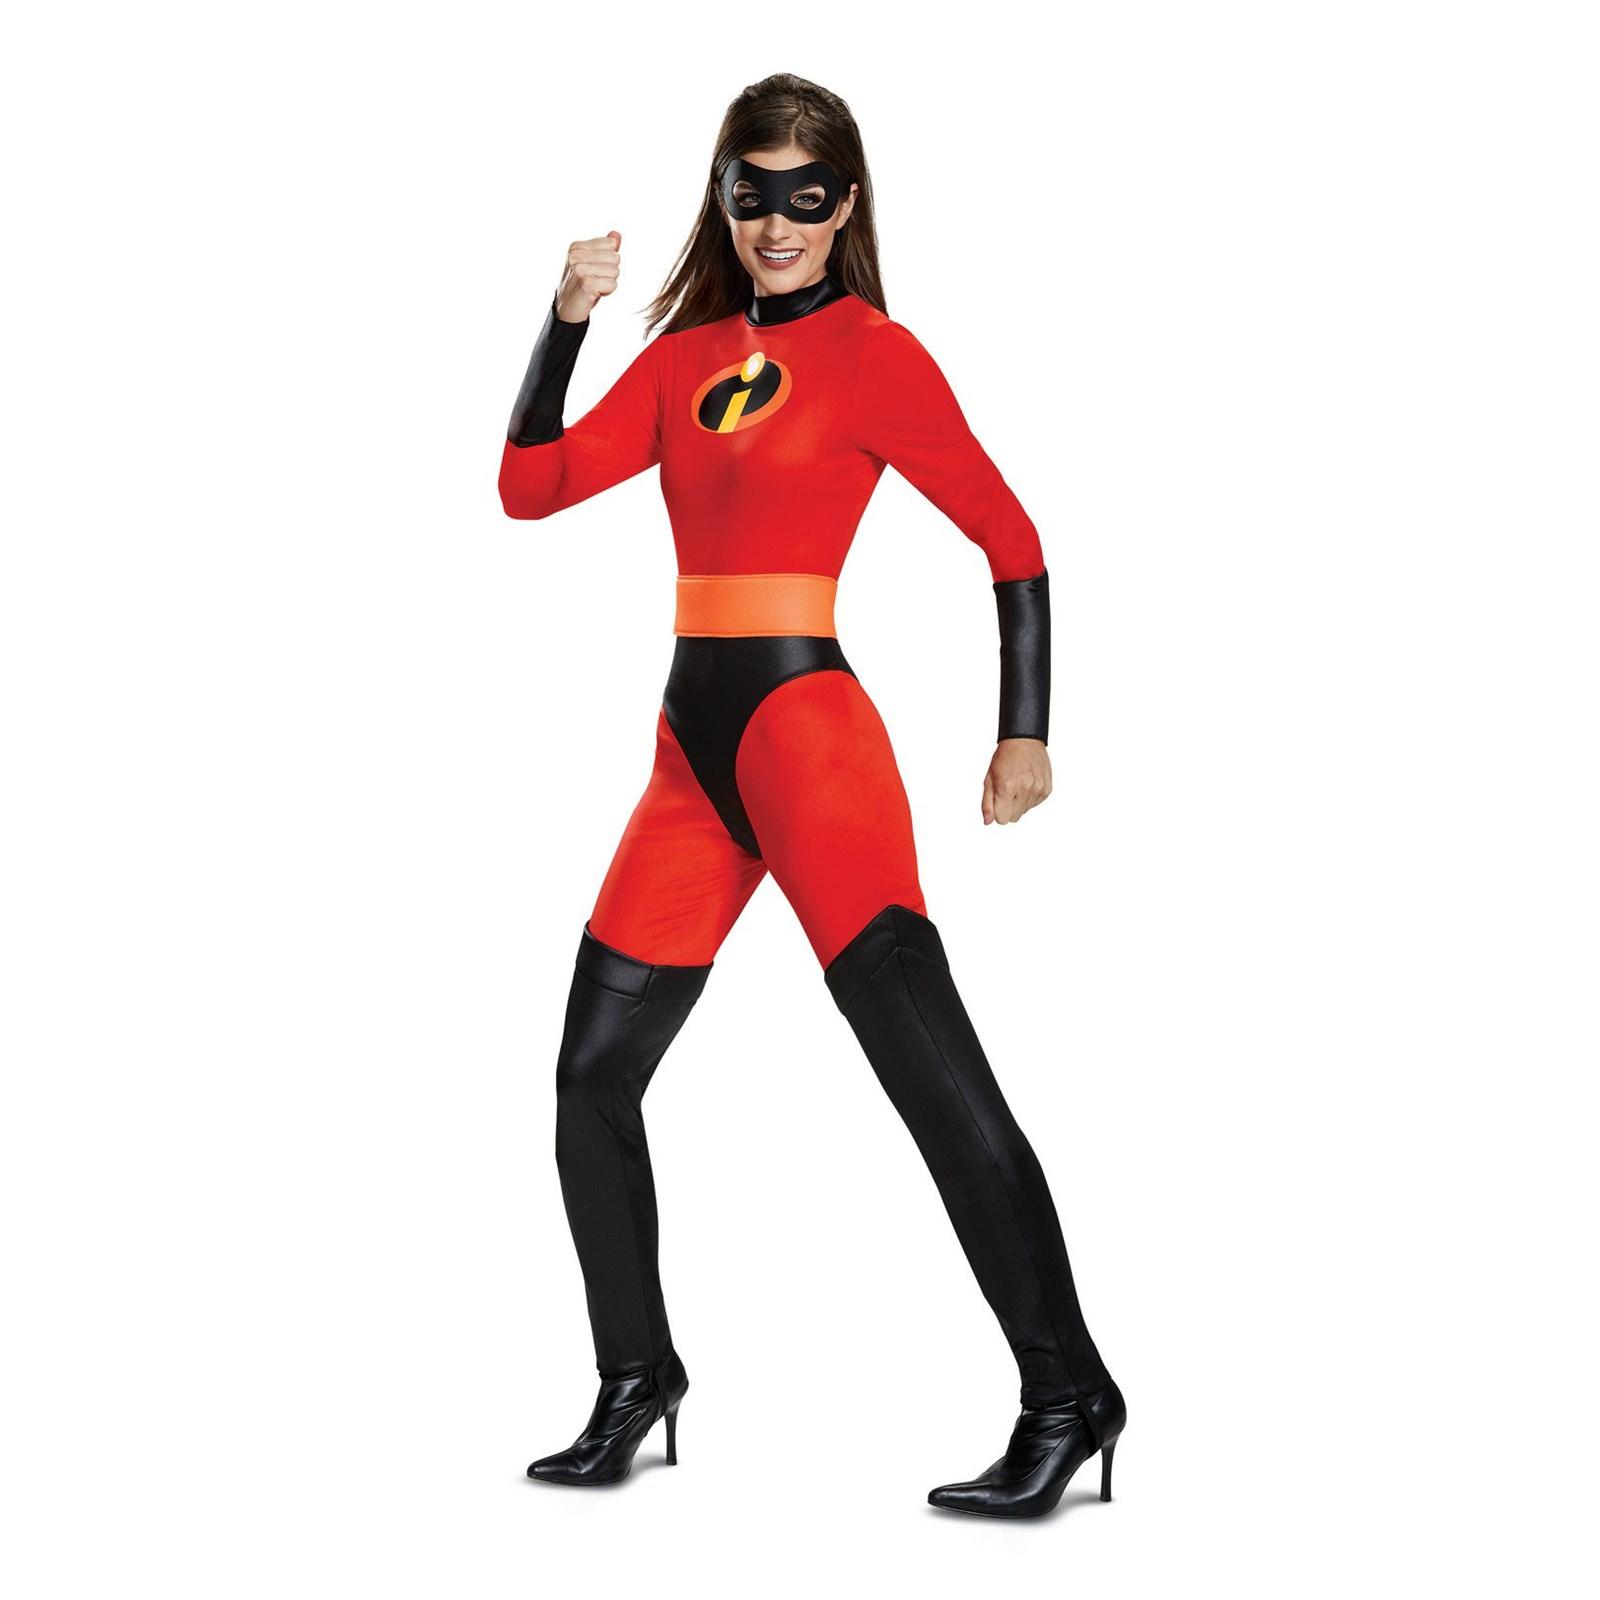 Incredibles 2 Mrs. Incredible Classic Adult Halloween Costume